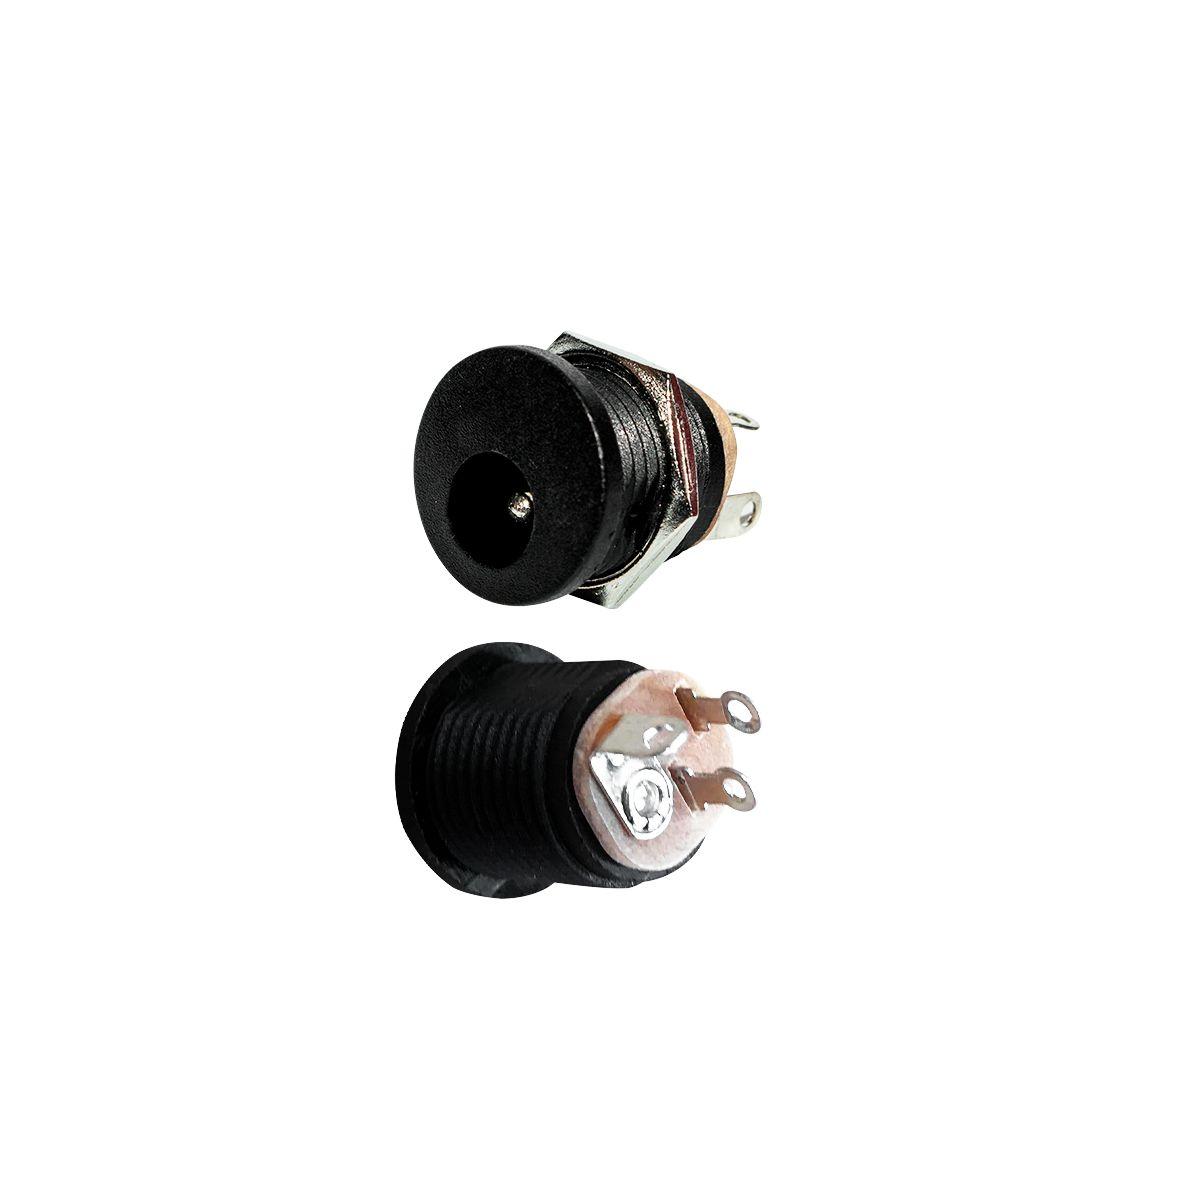 Kit 20 Unidades Conector Plug De Energia P4 Macho + 20 Unidades Plug Jack Tipo P4 Fêmea Com Rosca